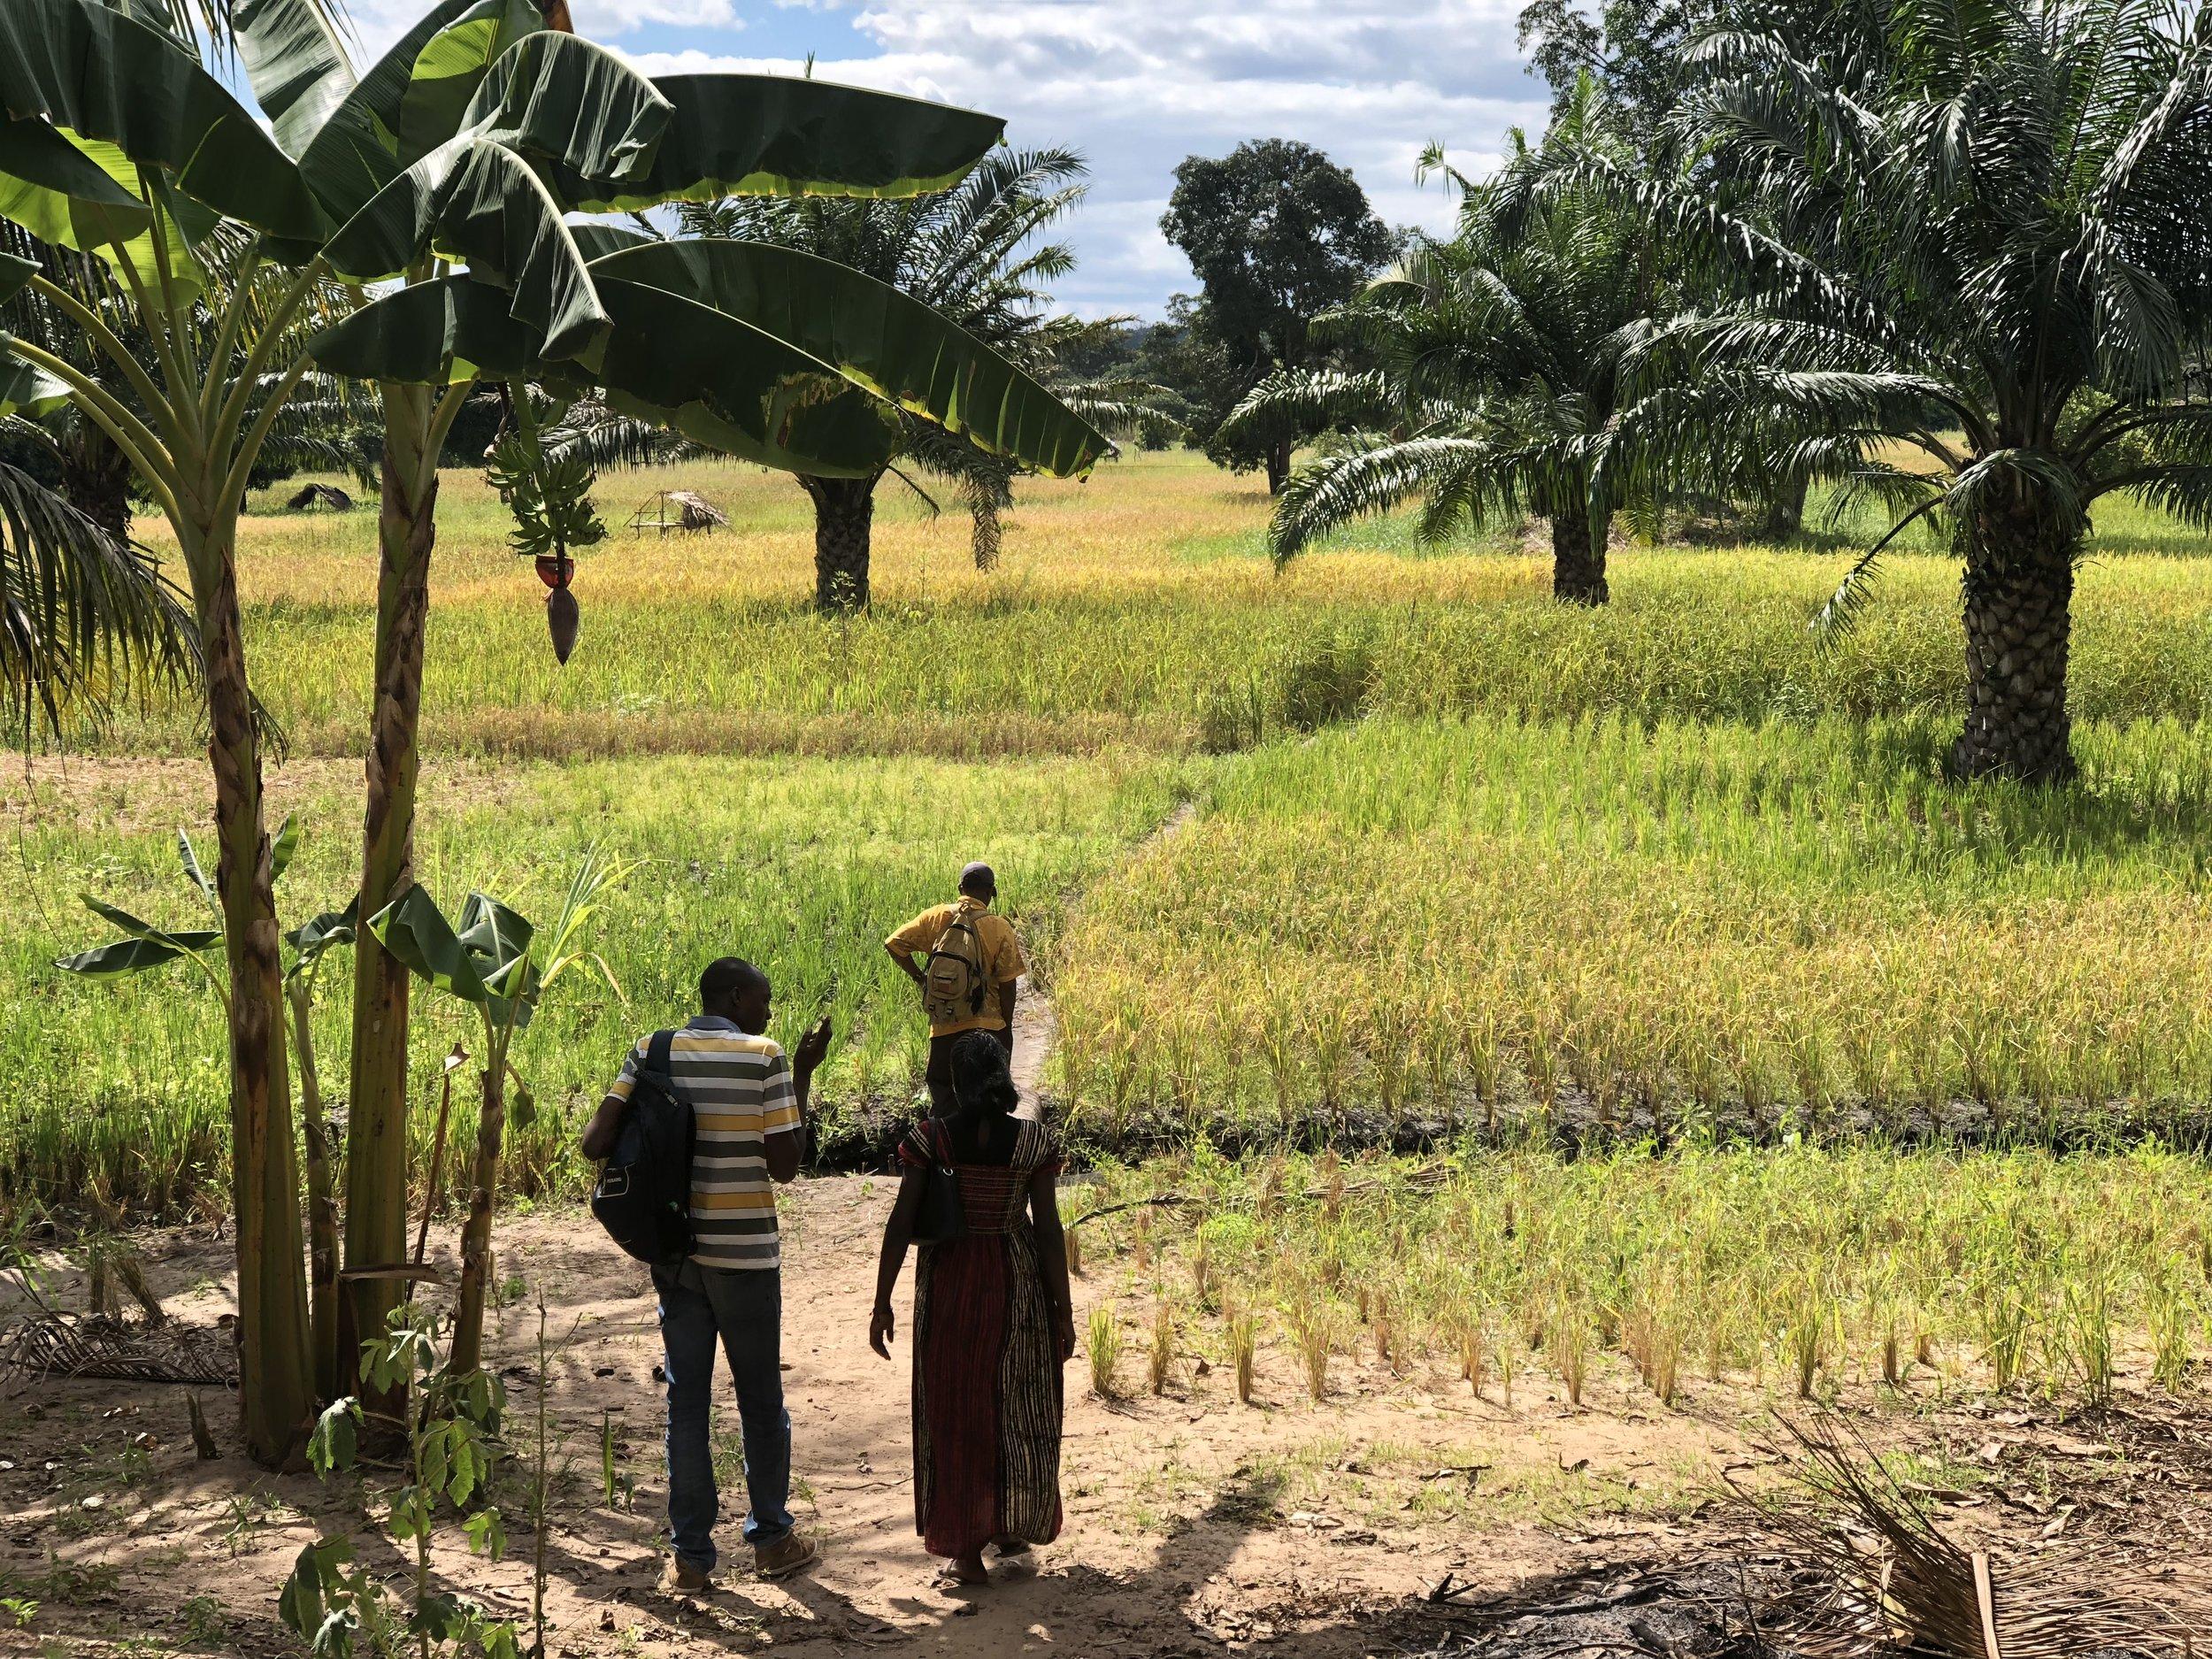 Utenfor en landsby I Rufiji, Tanzania. Foto: Mia Blakstad